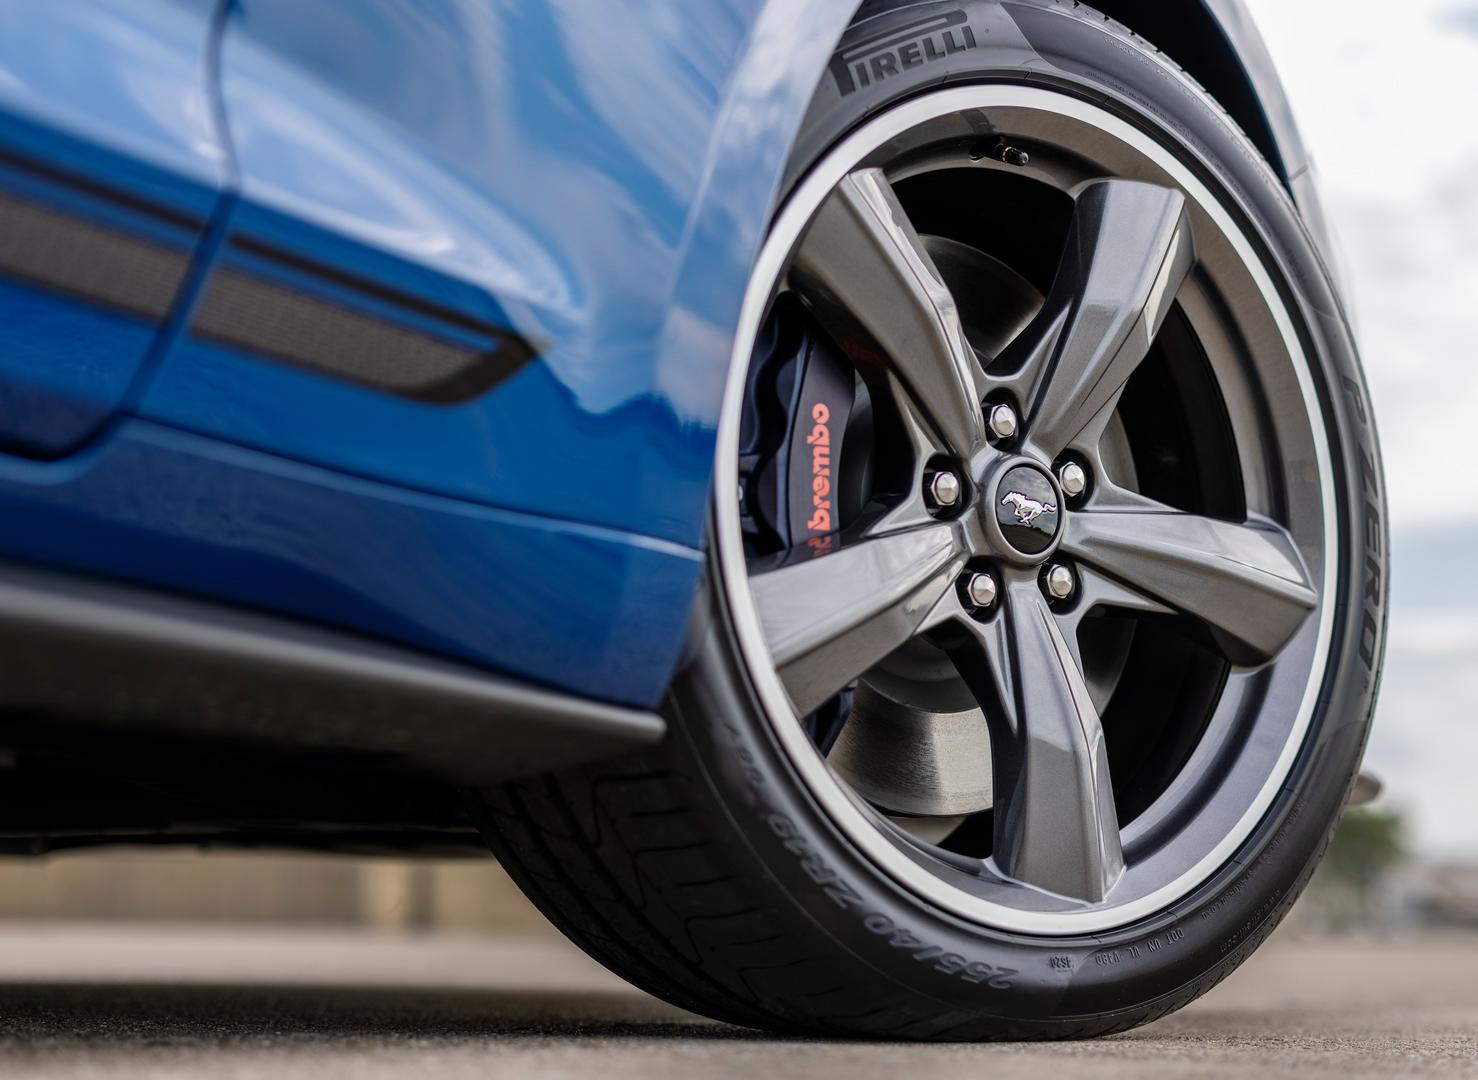 2022 Mustang GT Wheels